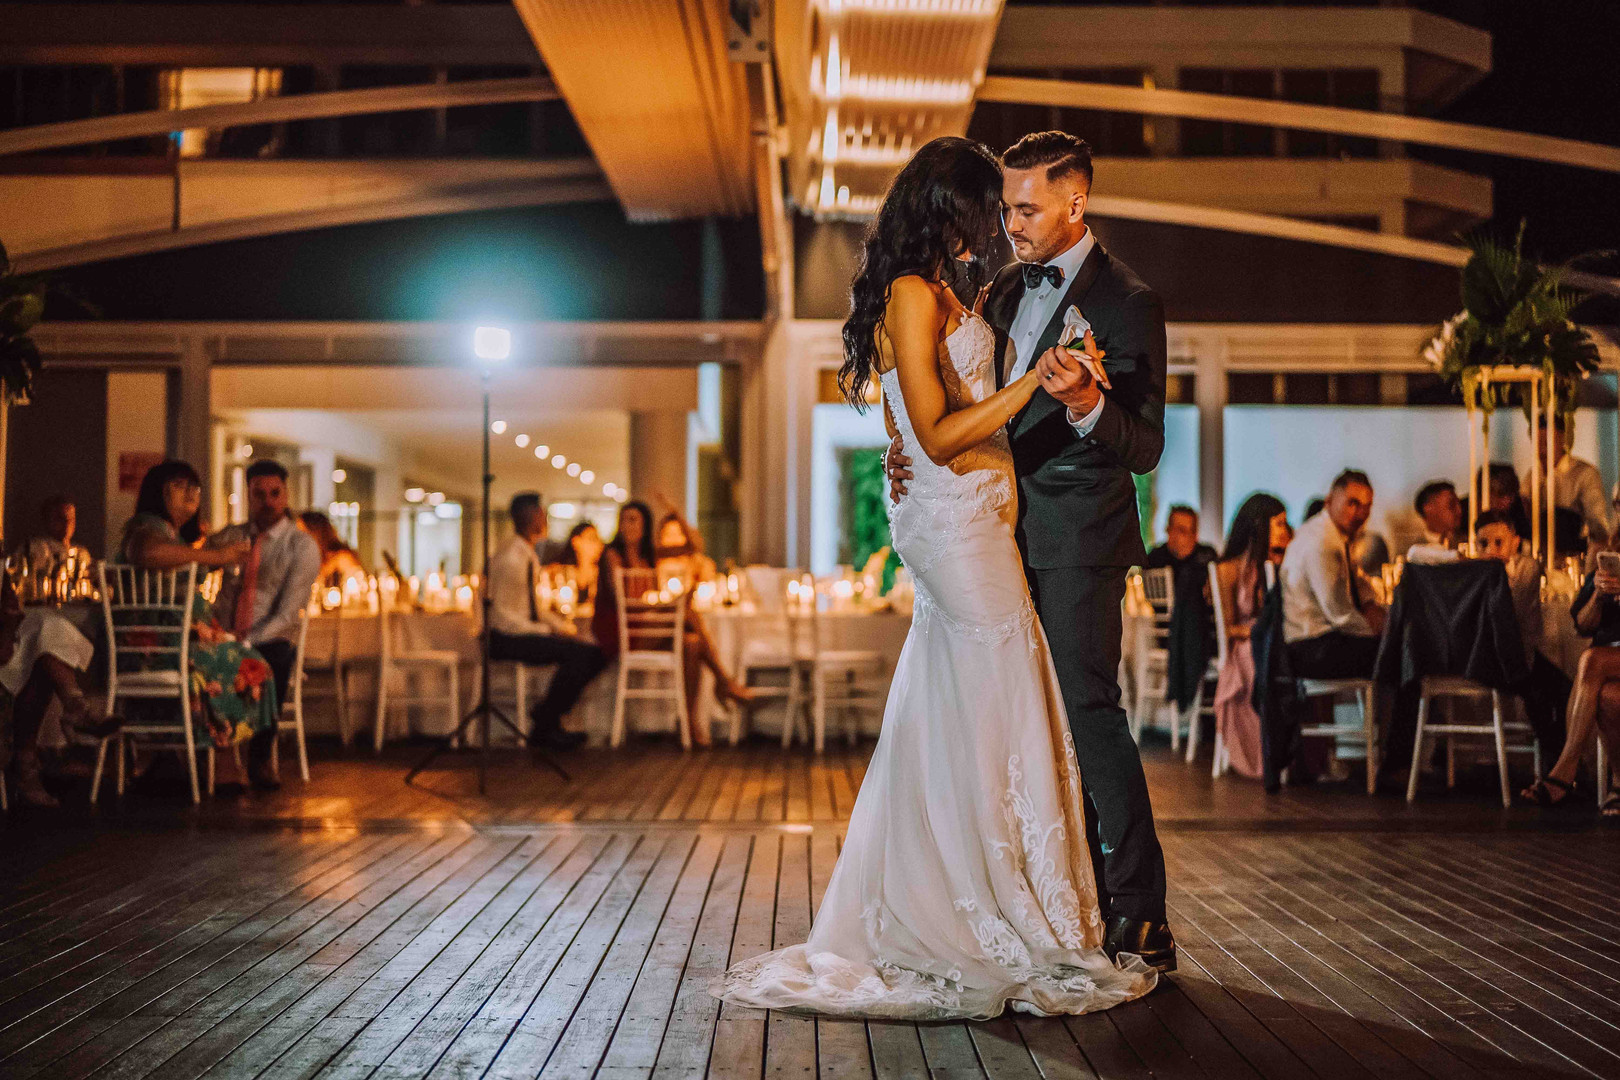 WeddingWebsite_Compressed_A2-29.jpg